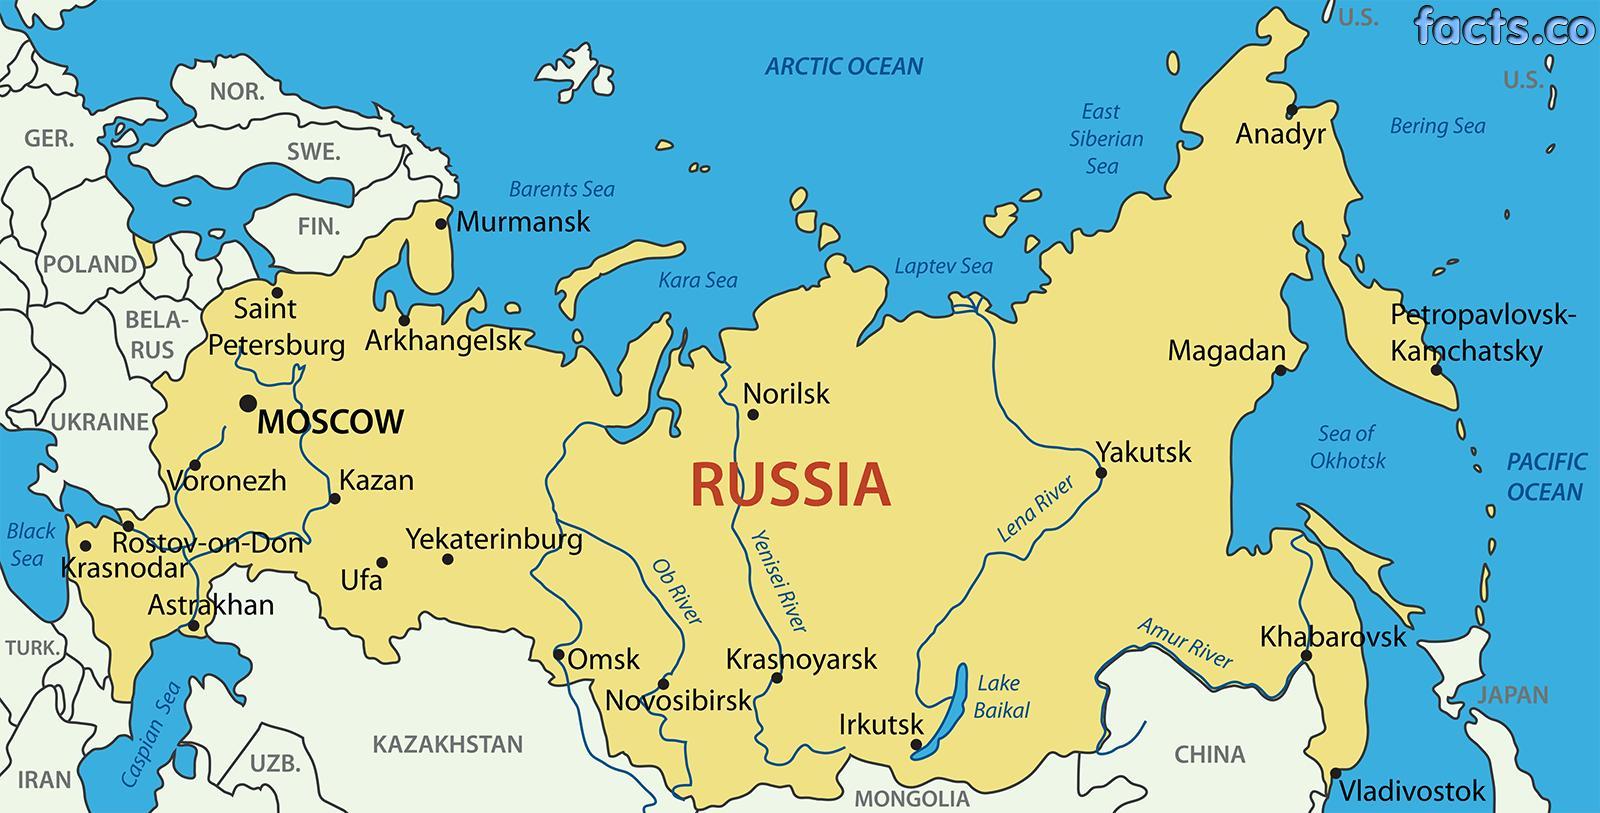 russland kart Russland kart byer   Byer i Russland kart (Øst Europa   Europa)